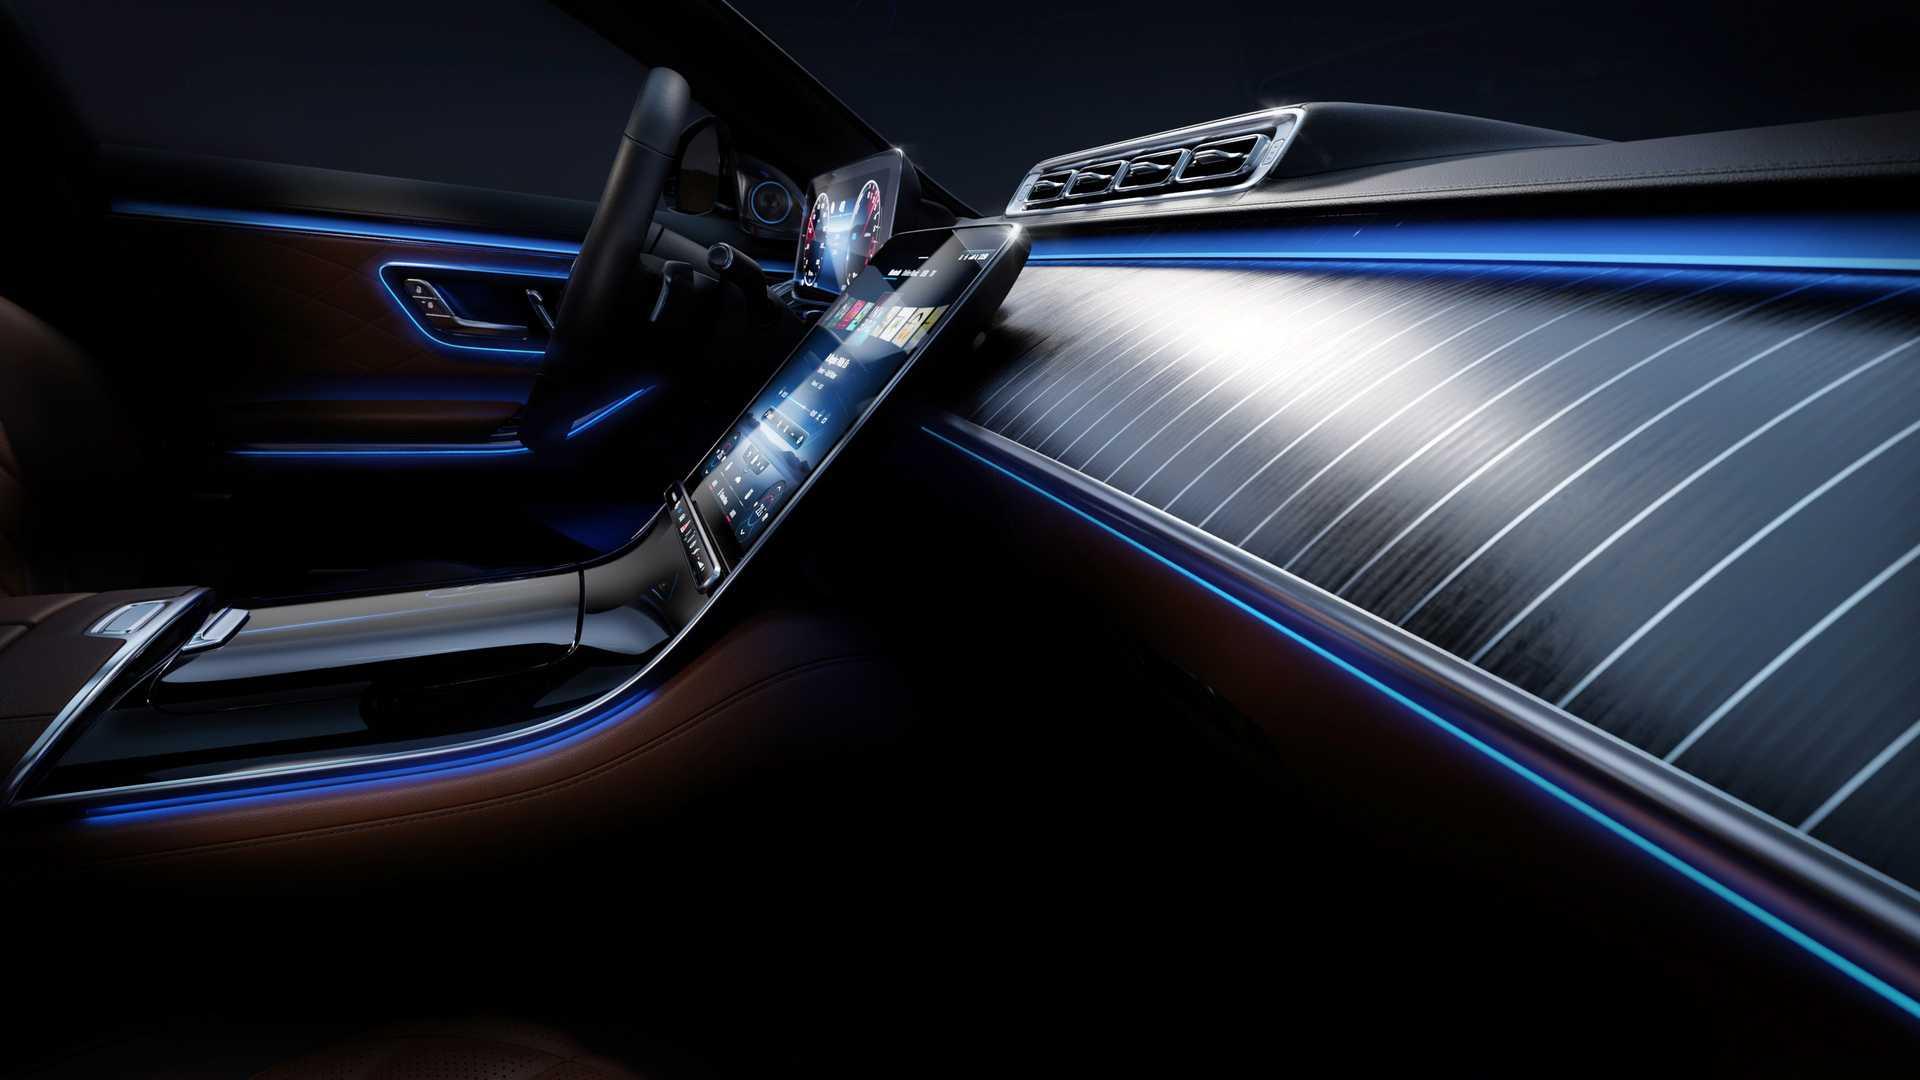 M-Benz S-Class透過飾條提升大面積木質飾板質感。(圖片來源/ Mercedes-Benz) 這不是遊艇! 新一代S-Class超炫內裝最新曝光